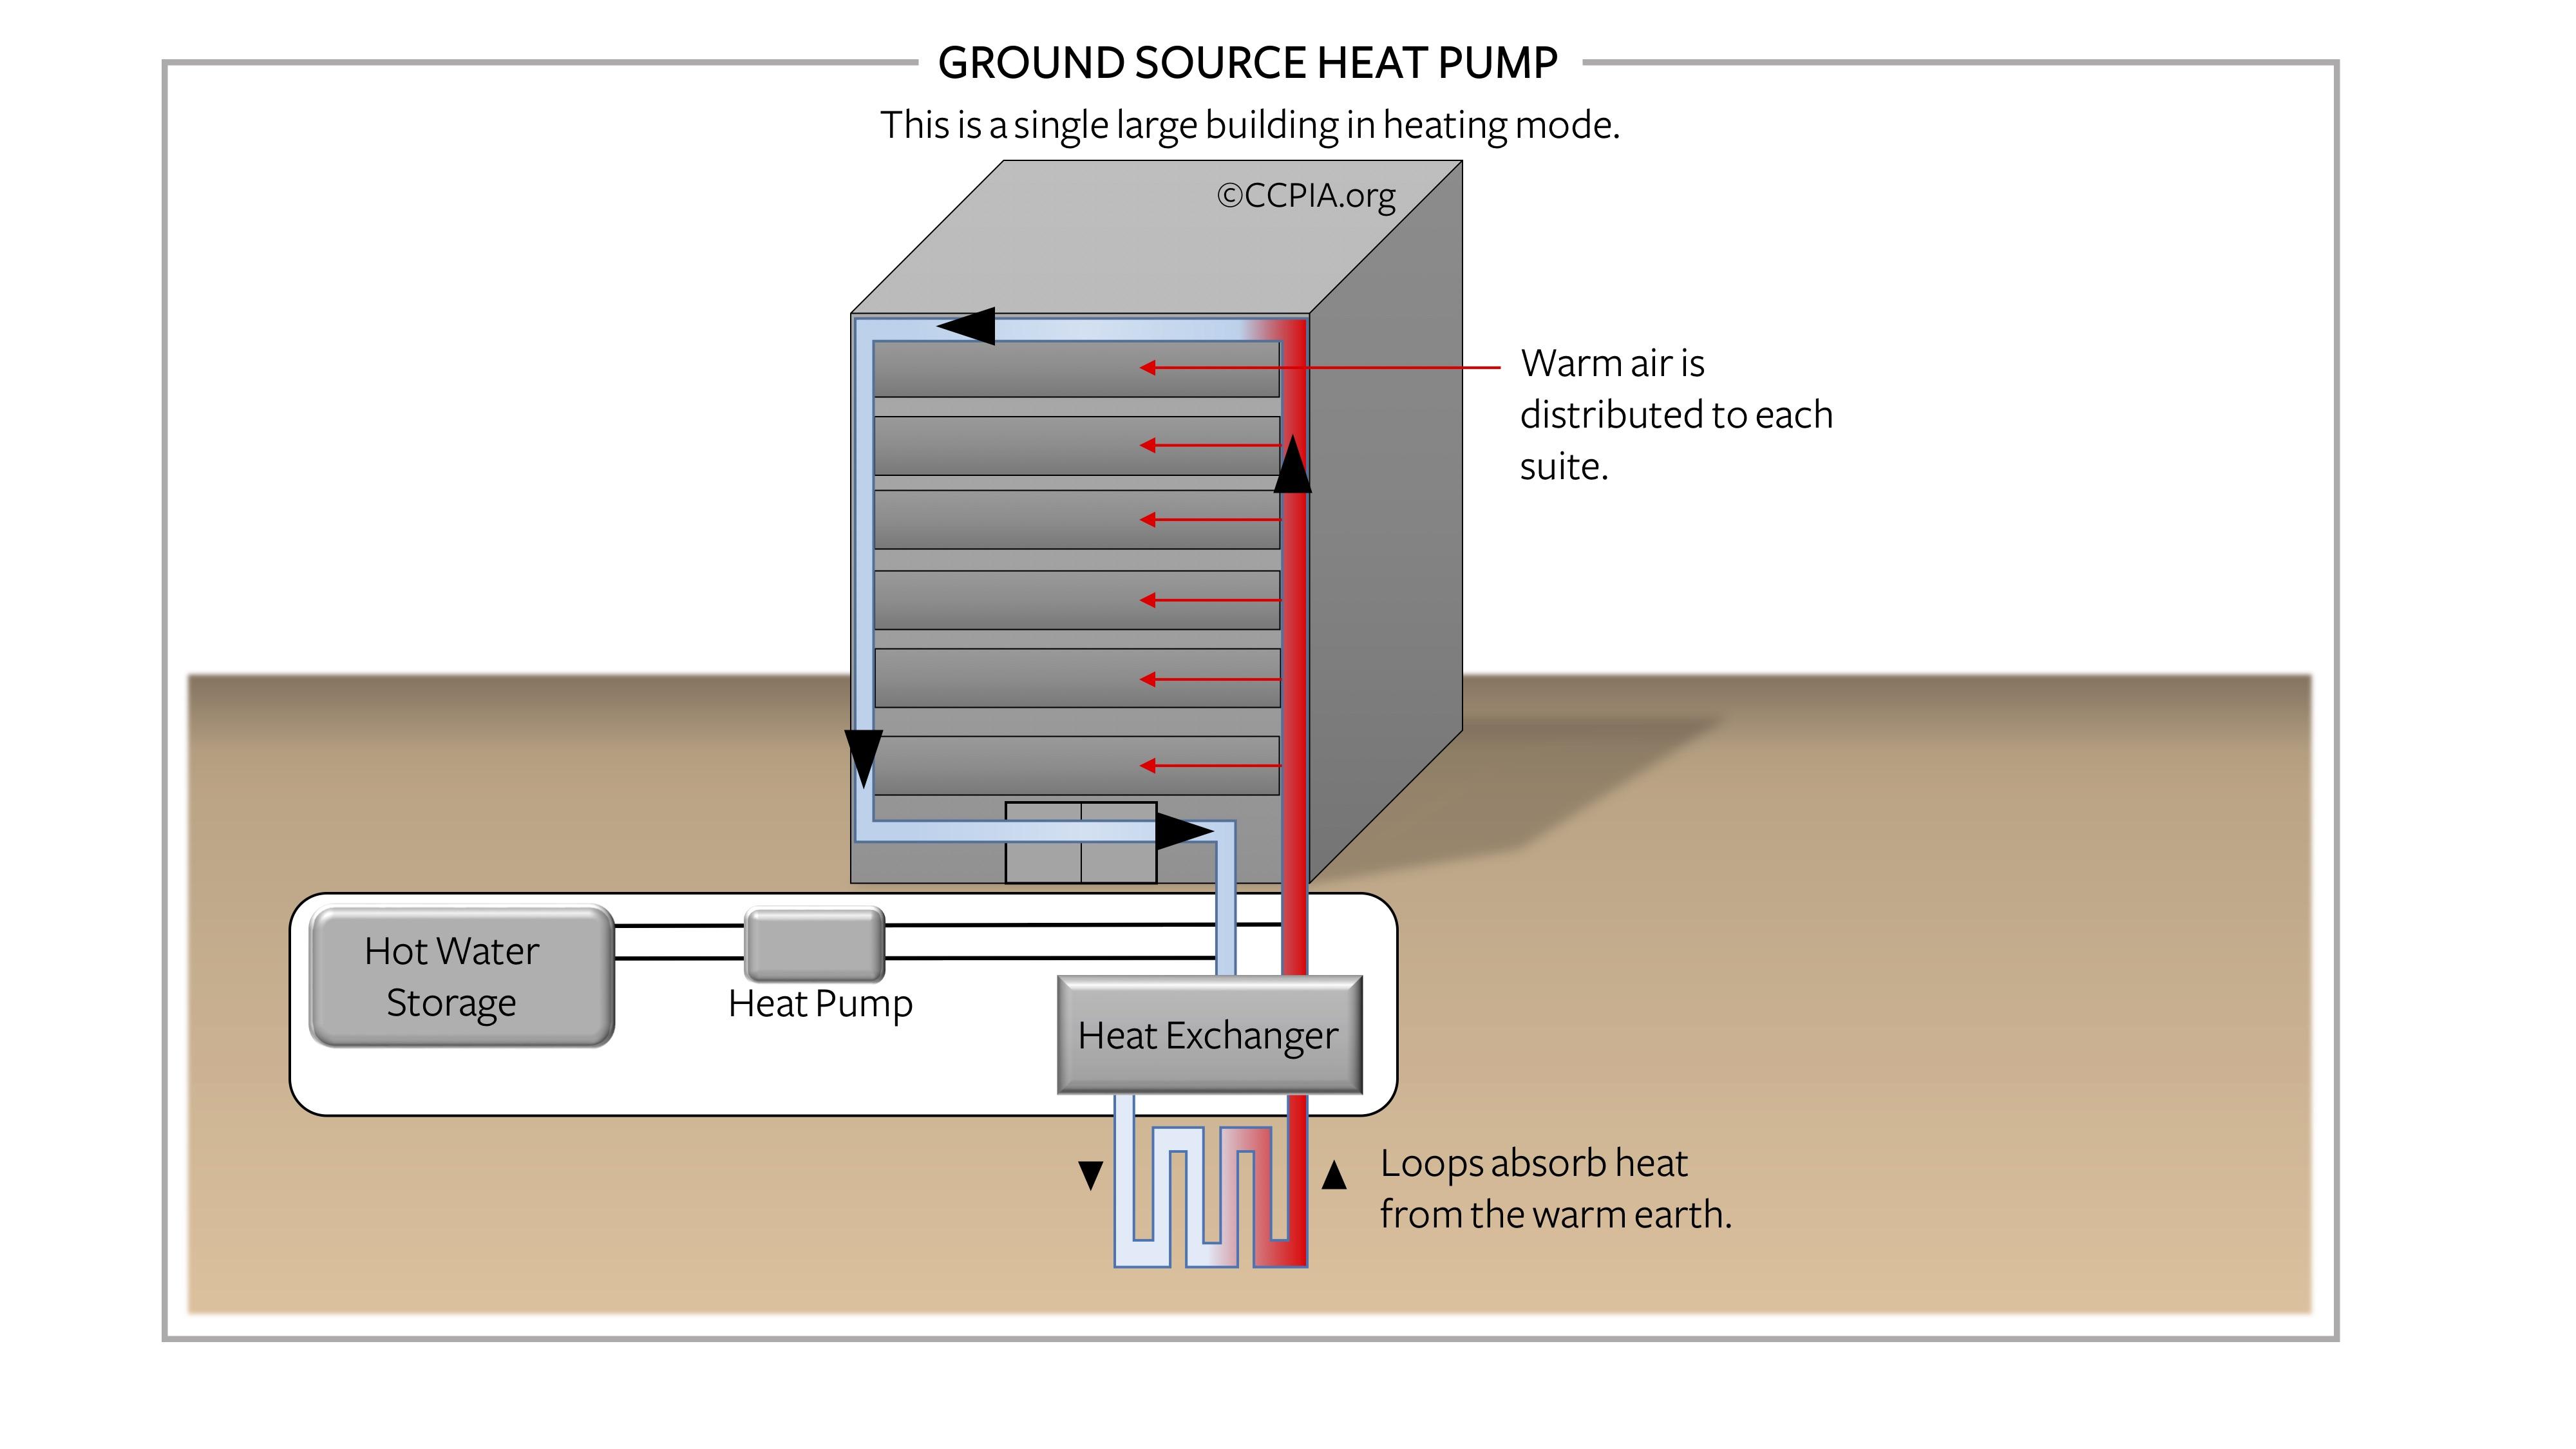 Commercial building ground source heat pump.